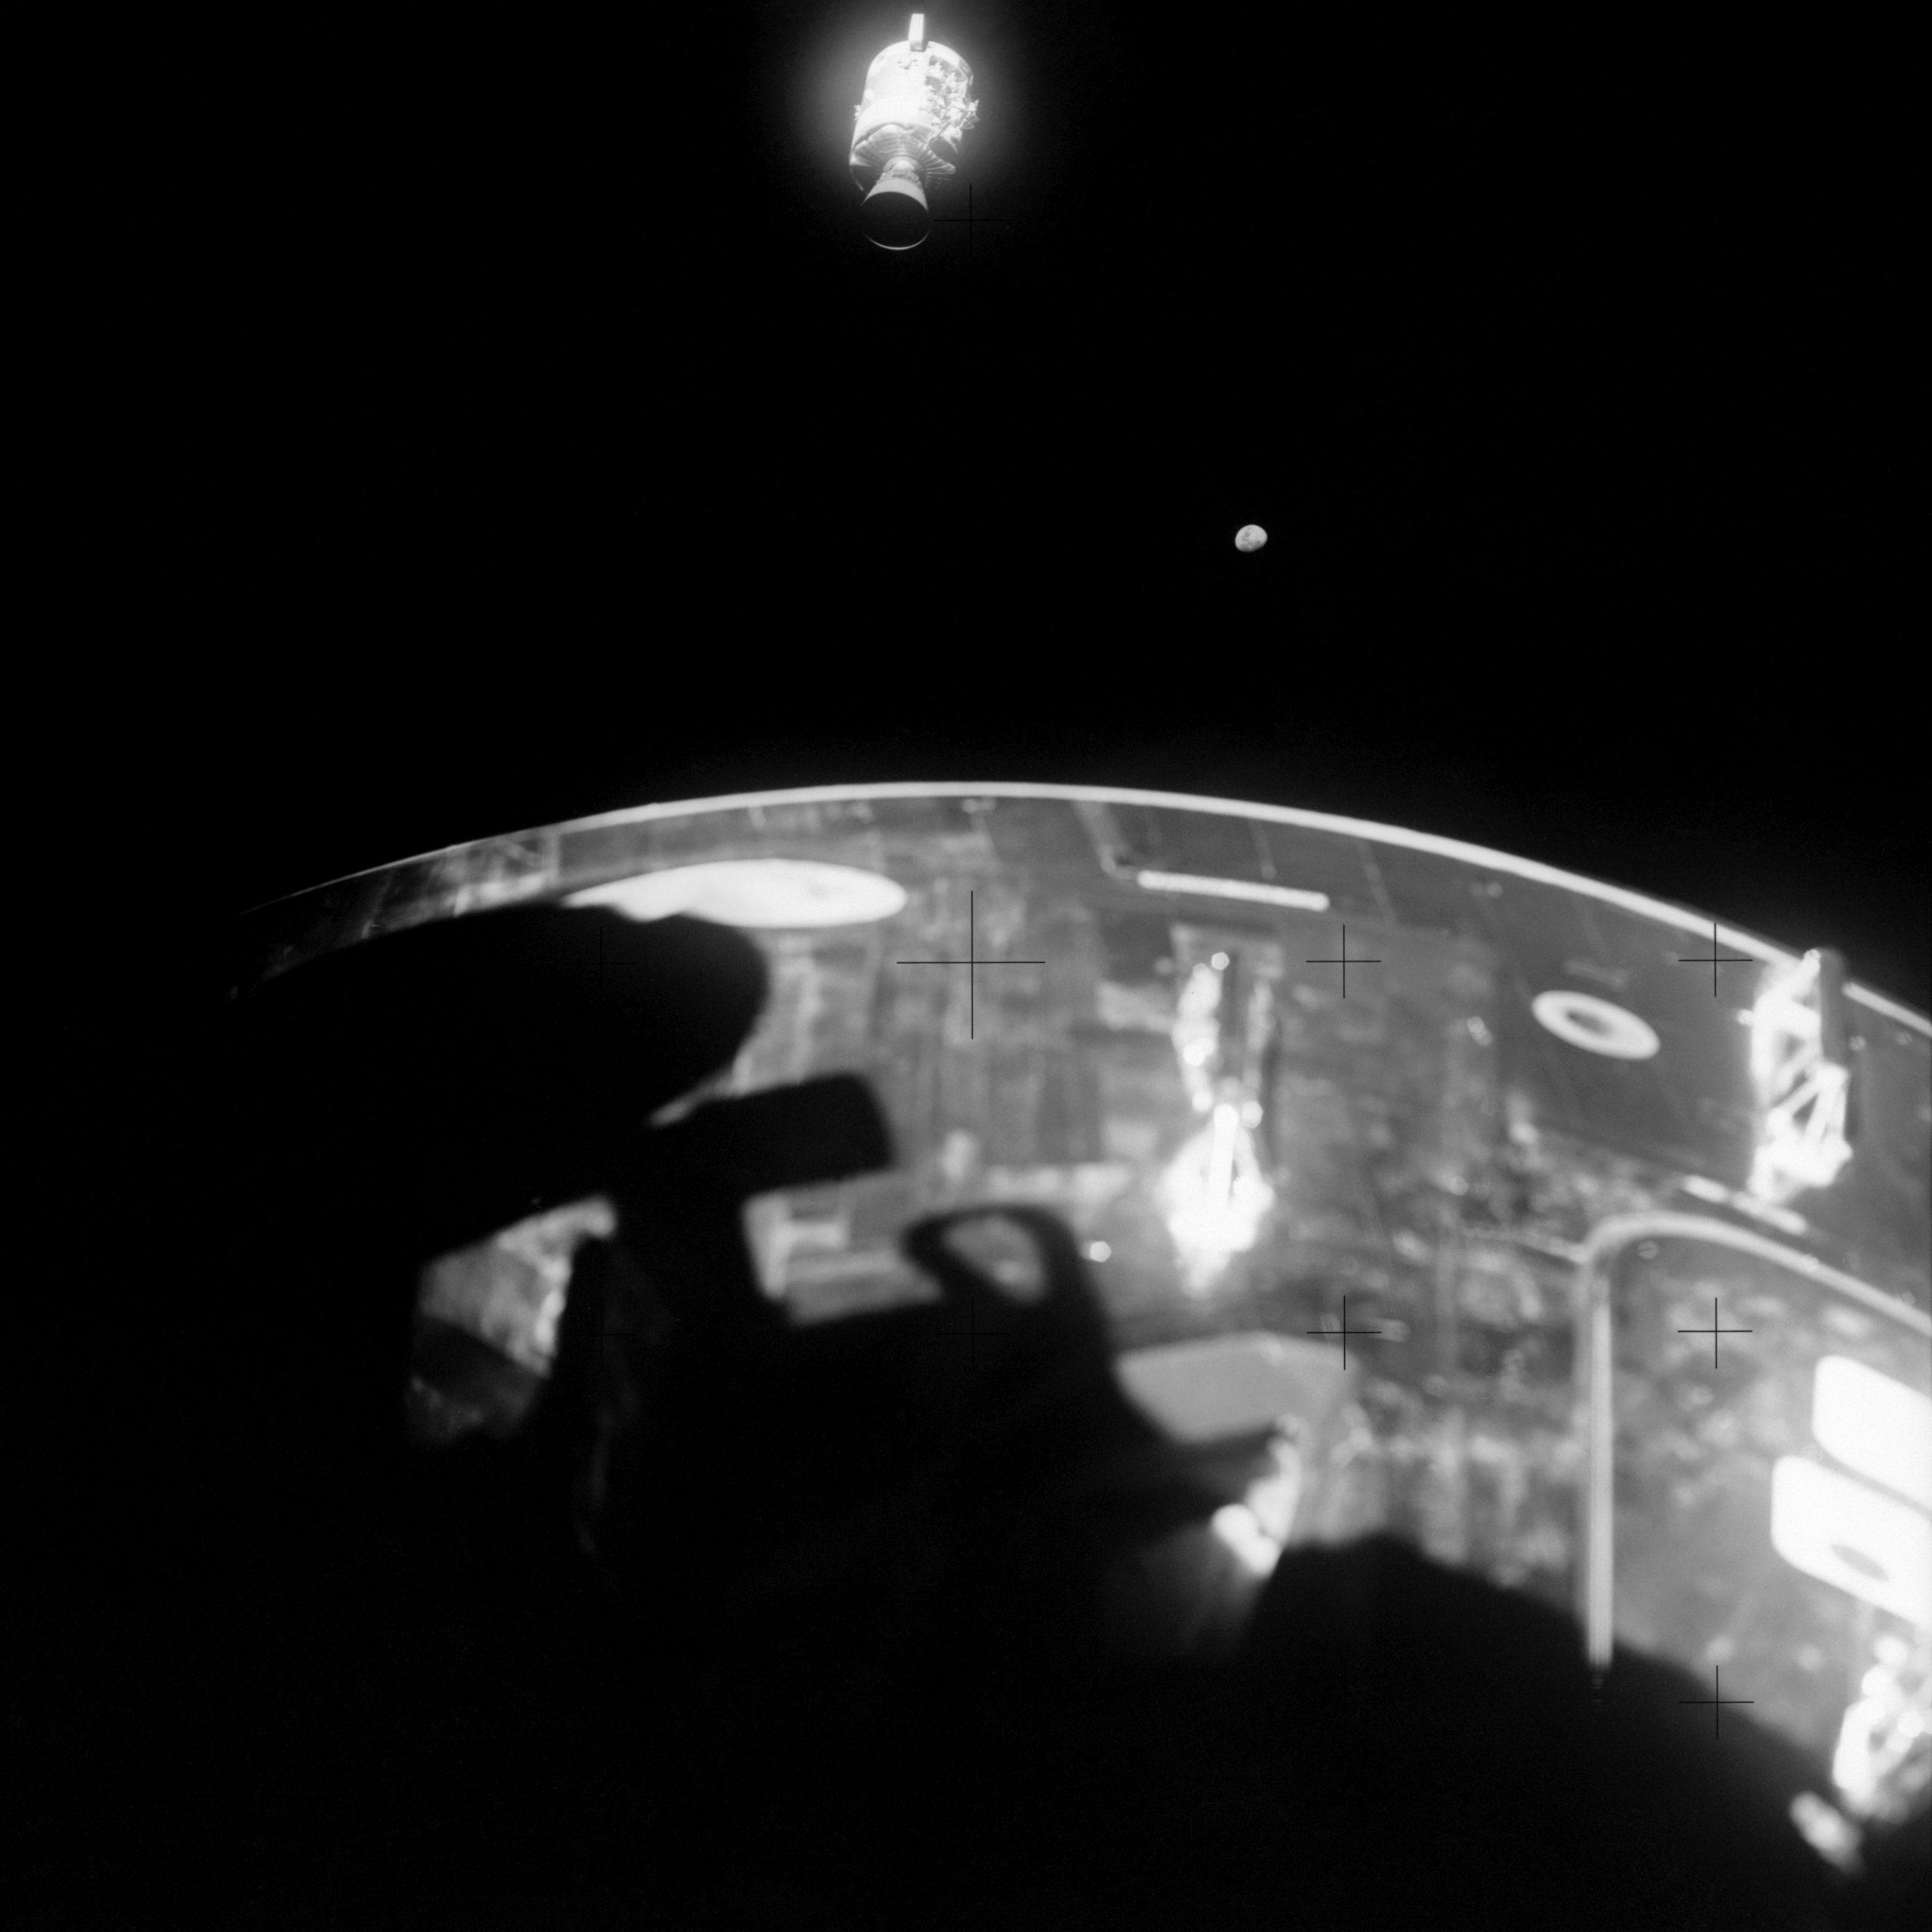 View of damaged Apollo 13 service module